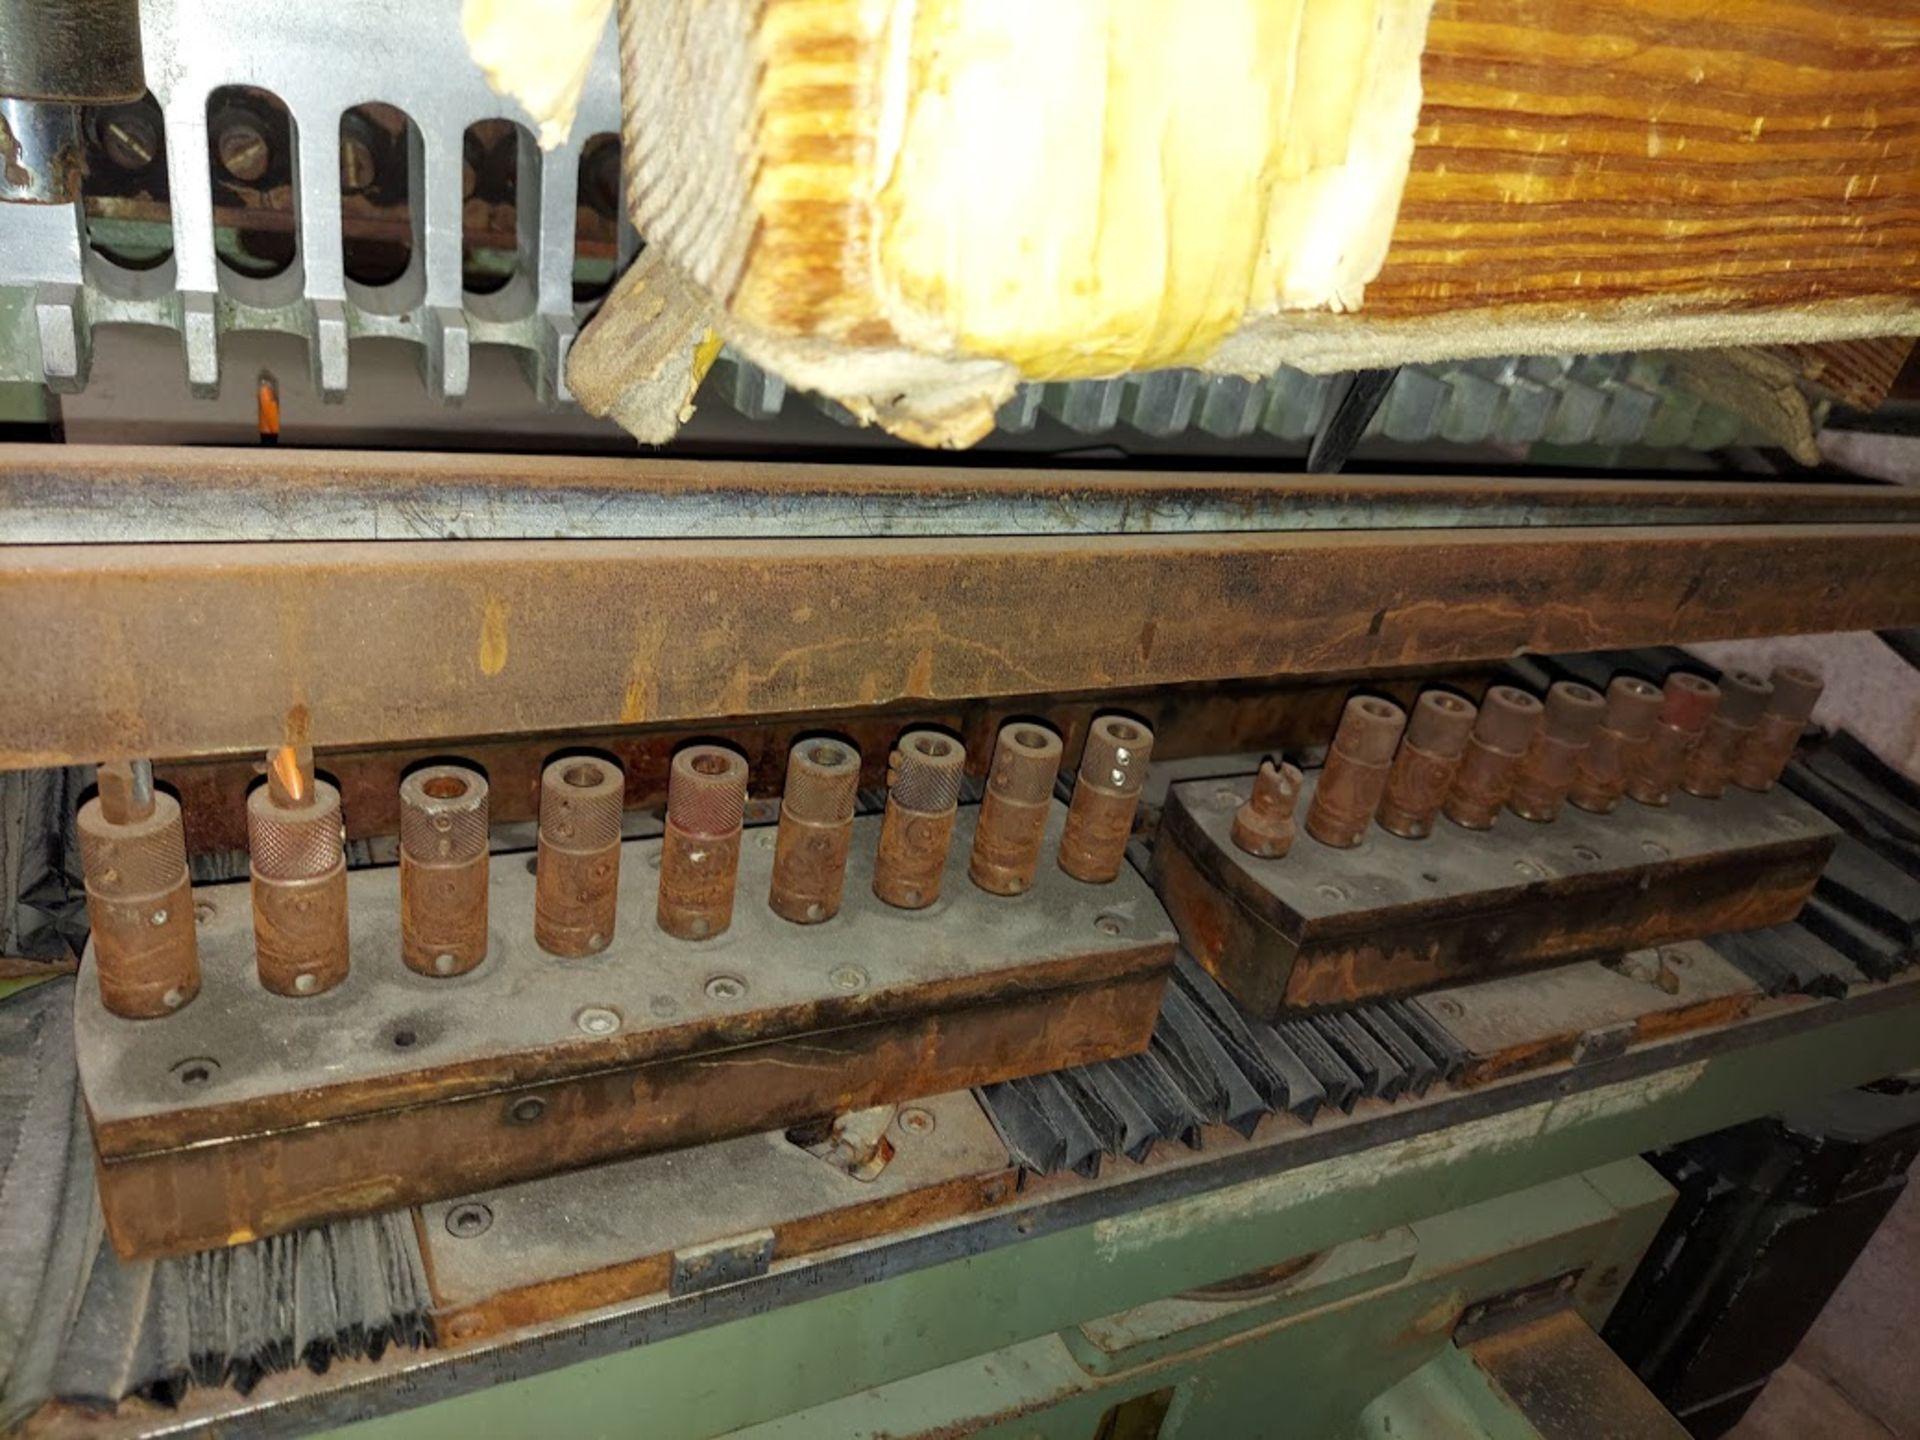 Zangheri & Boschetti Mulit Mat P3 Line Boring Machine, Model #MP3, 1 - 21 Spindle Horizontal Drill - Image 3 of 7